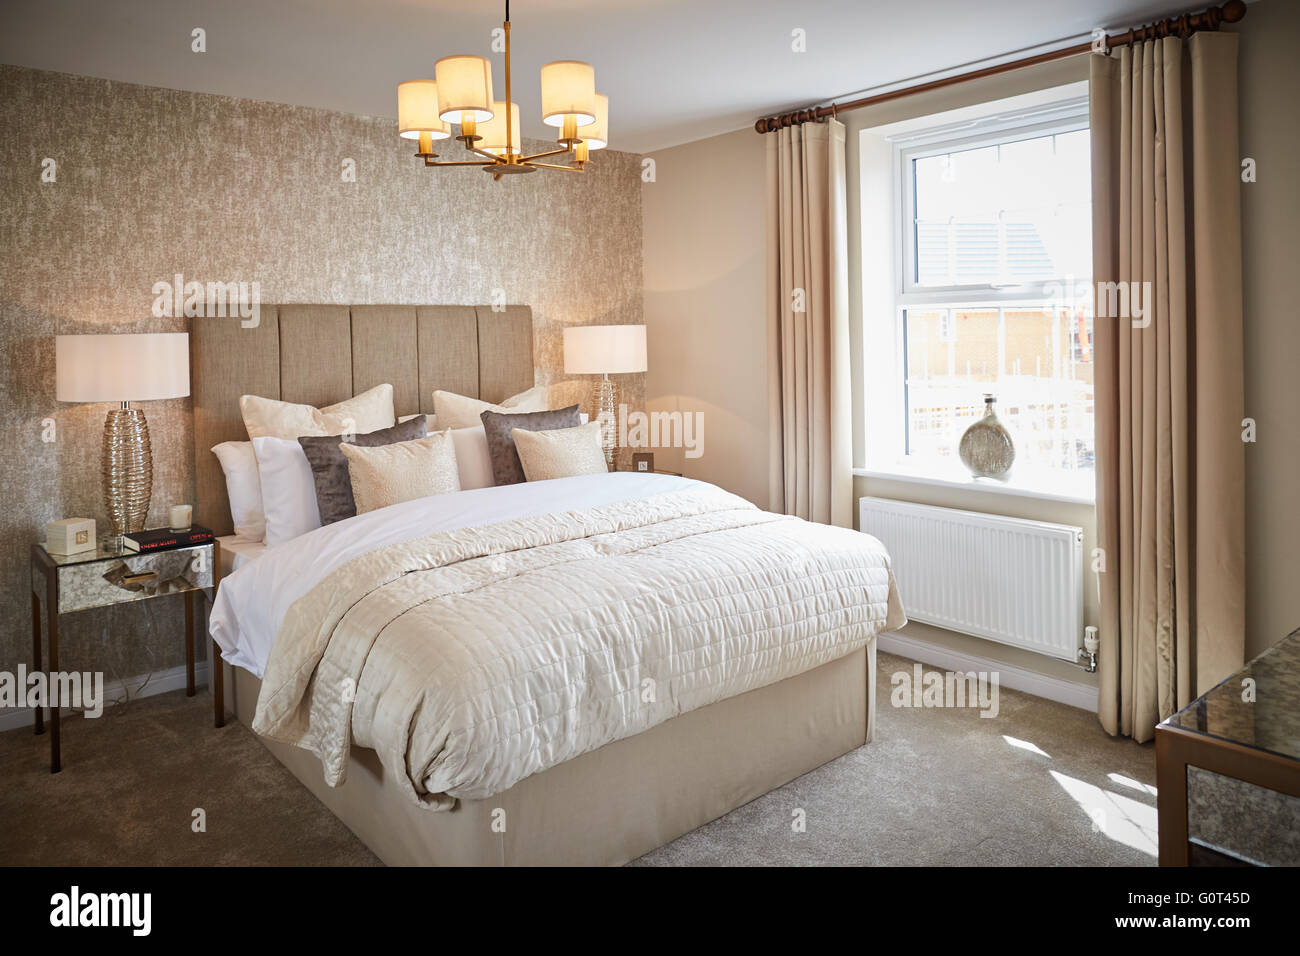 show home interior   main bedroom adult cream magnolia calm  space Suburban suburbia  suburbs town village local - Stock Image